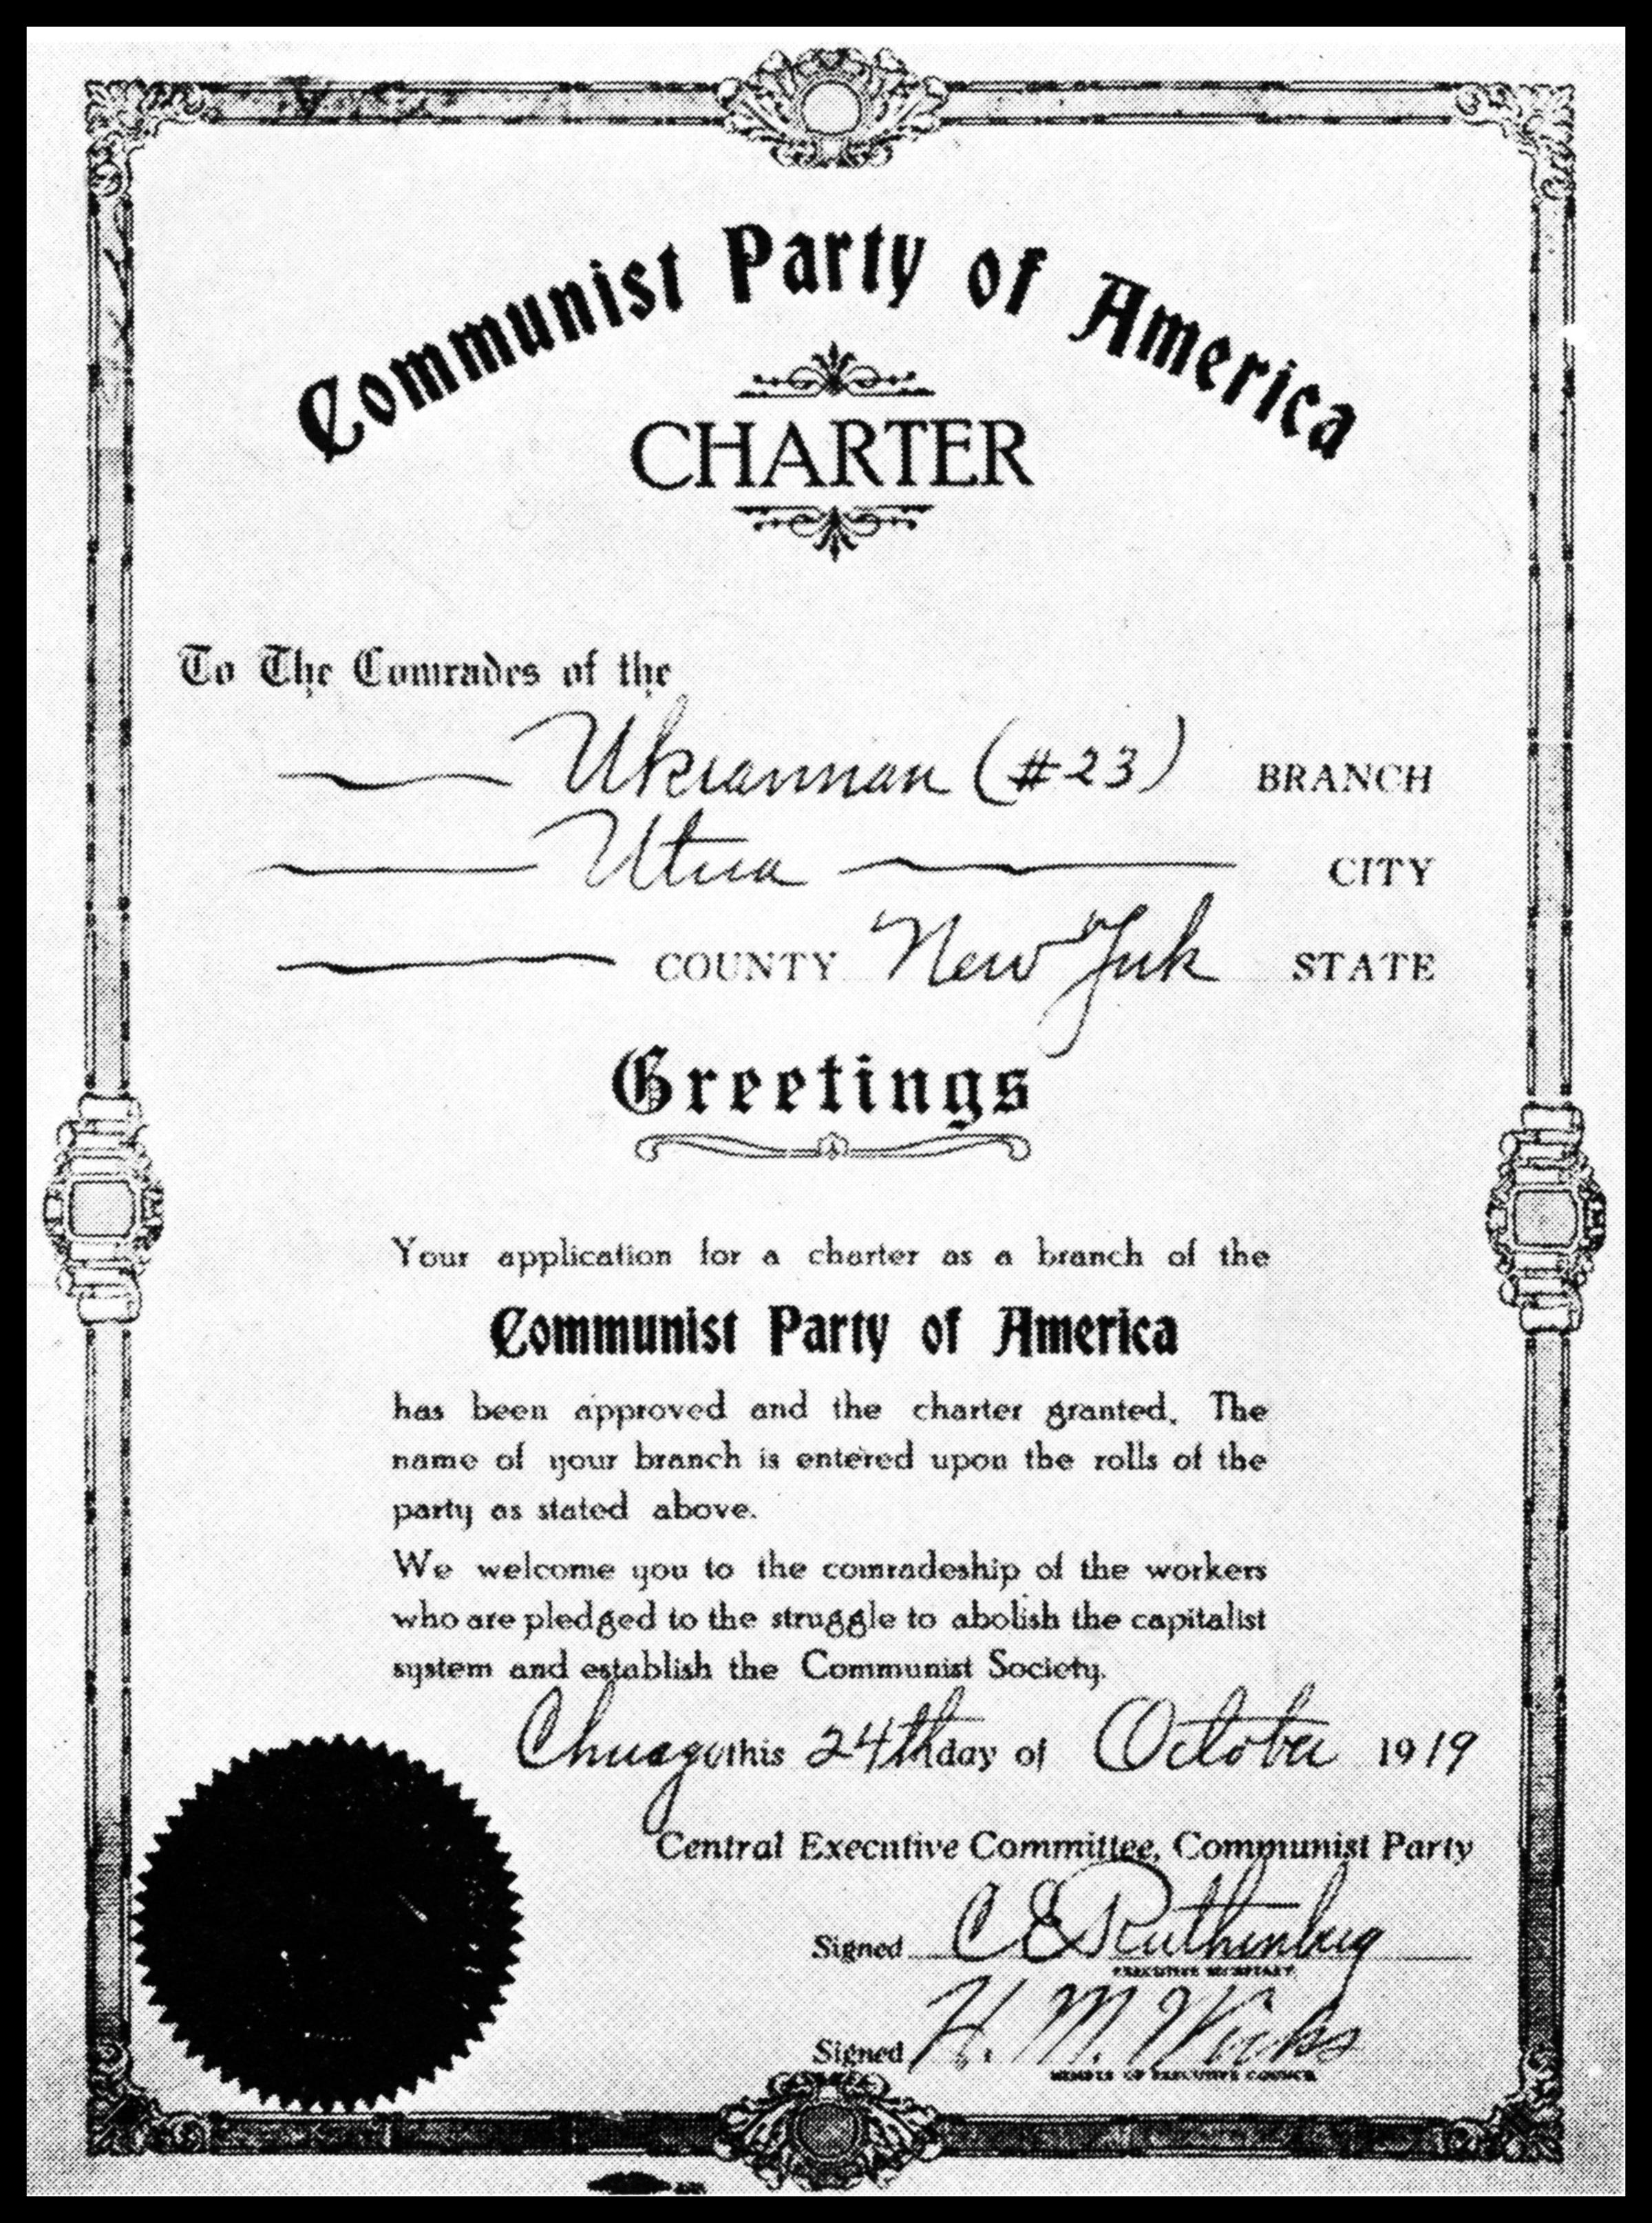 File:191024-cpa-charter-sm jpg - Wikipedia